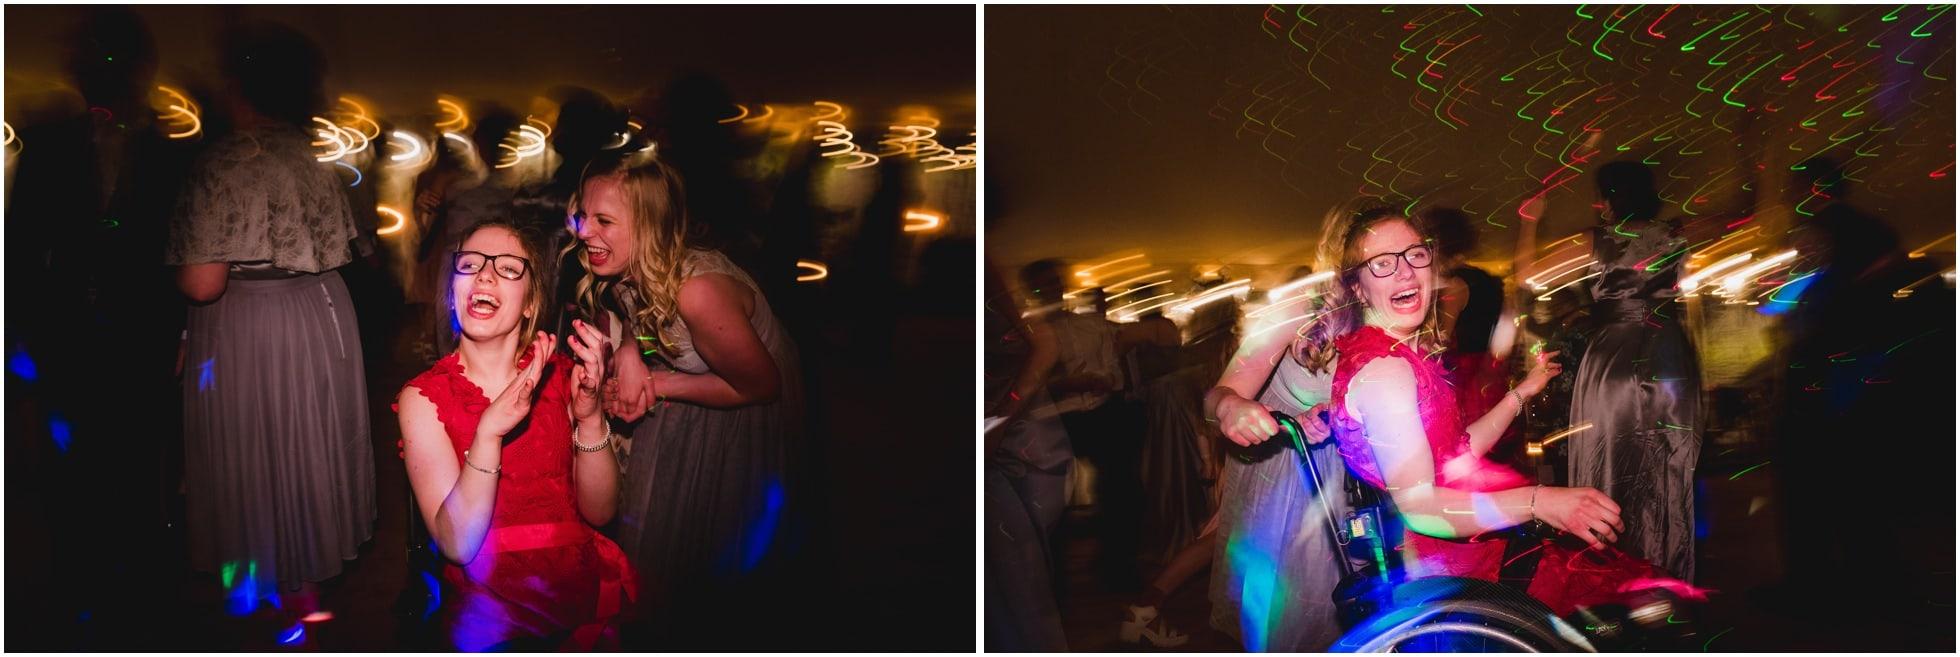 Lovely girl in wheelchair dancing the night away